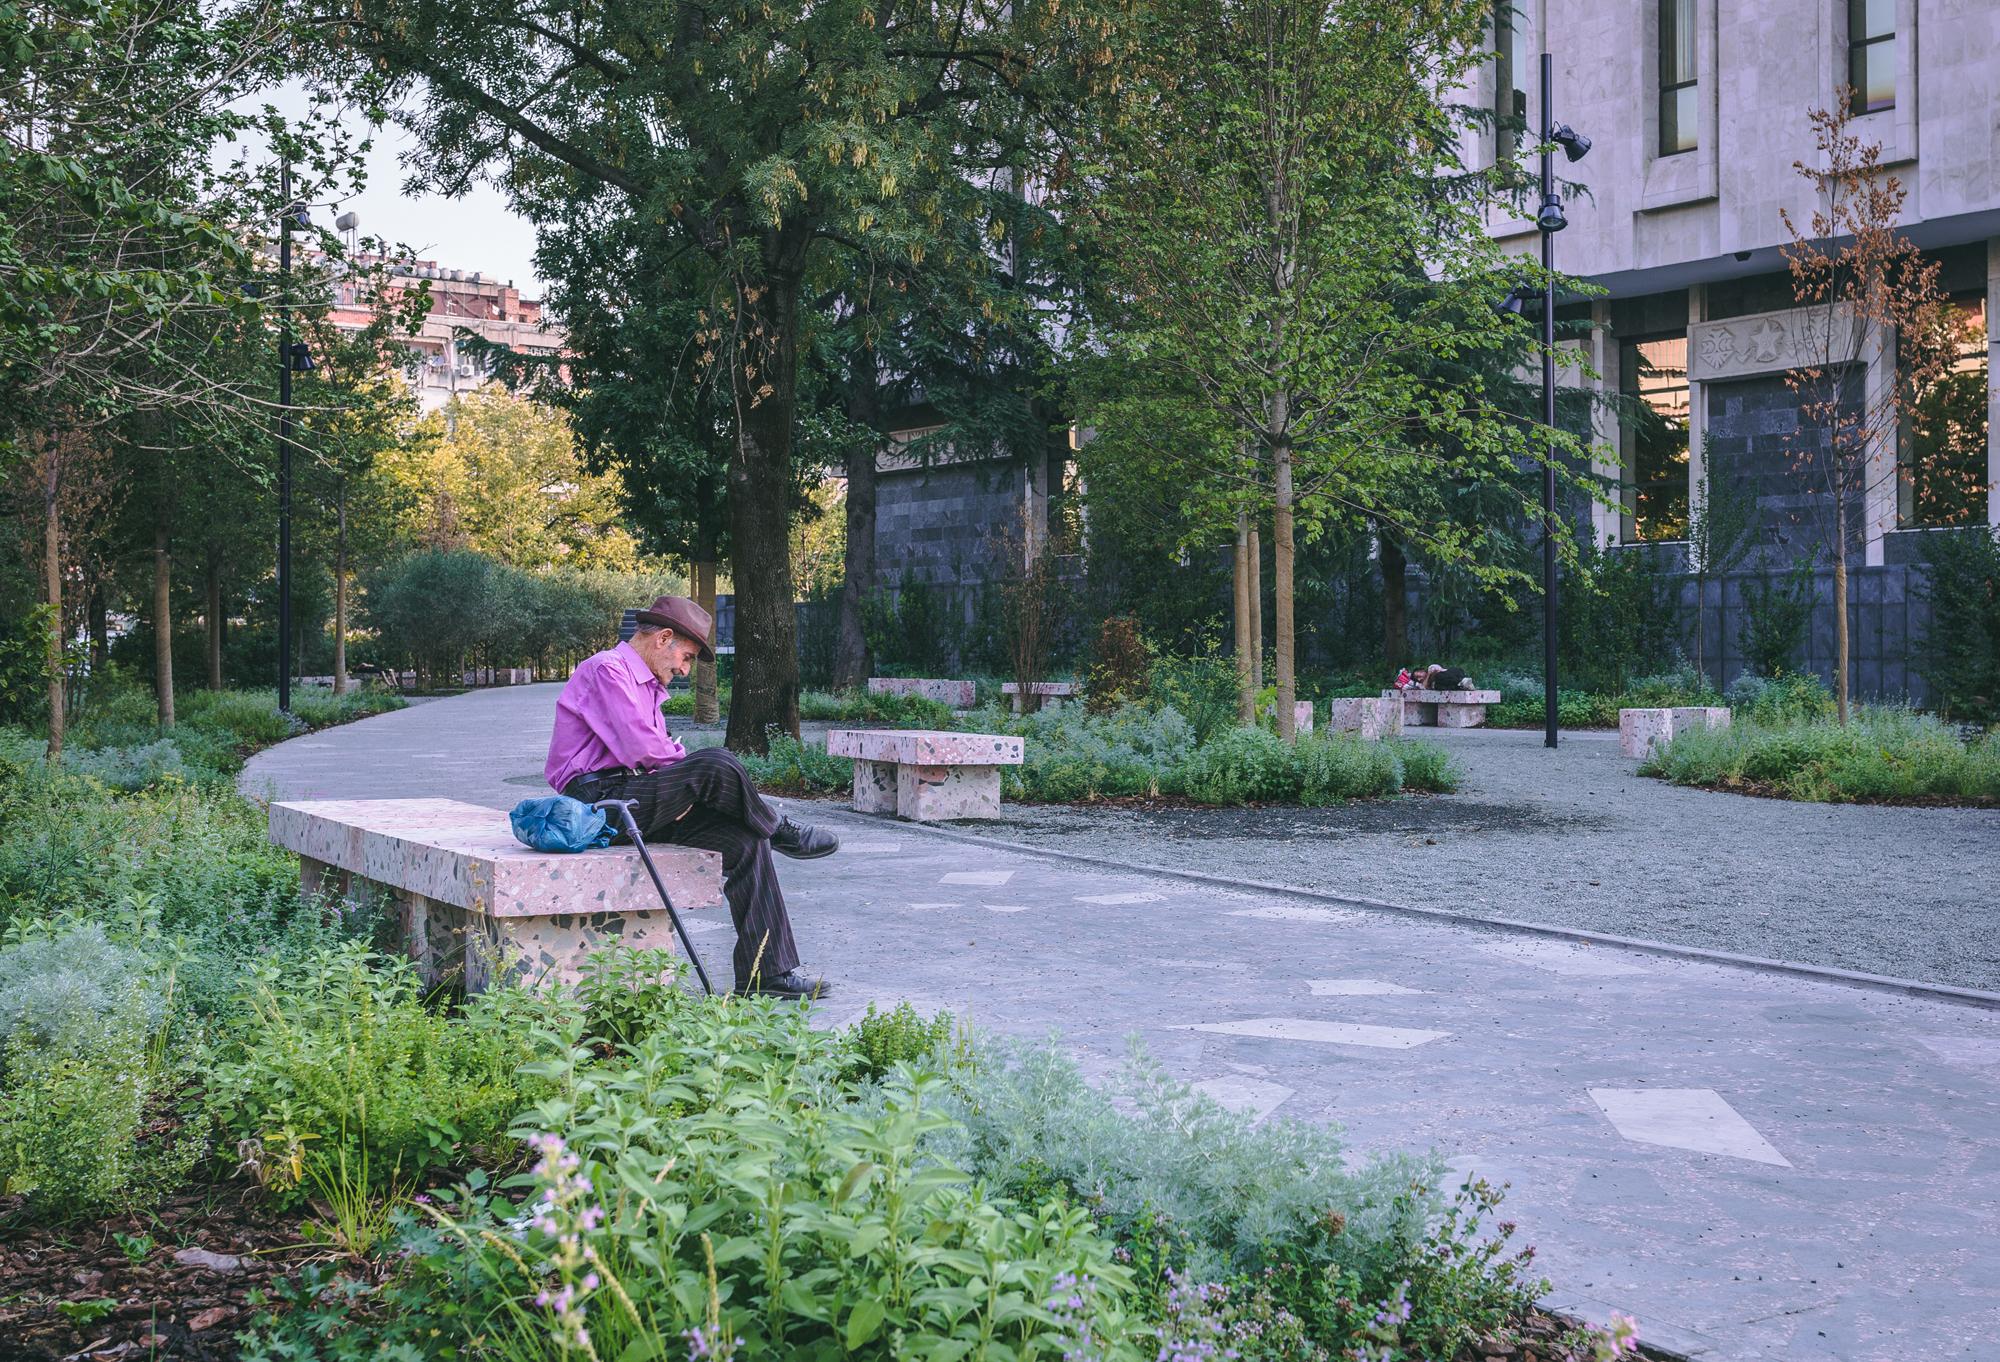 A man sitting on a bench in Tirana, Albania.